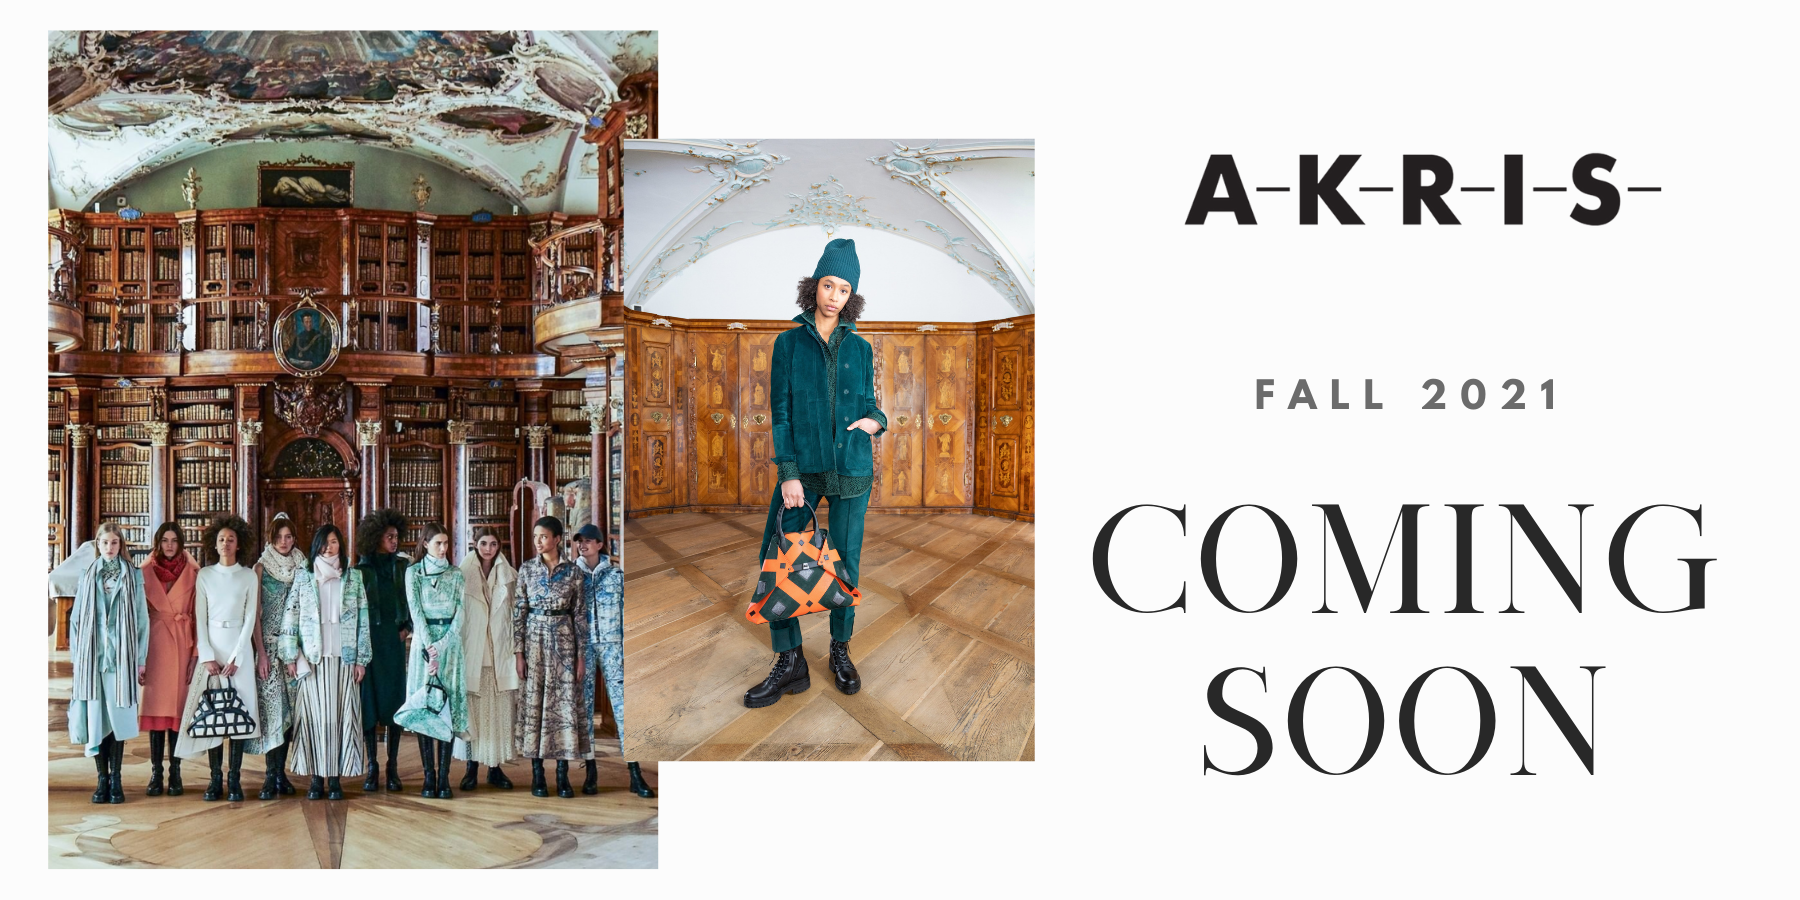 akris-fall-2021-coming-soon-1-.png